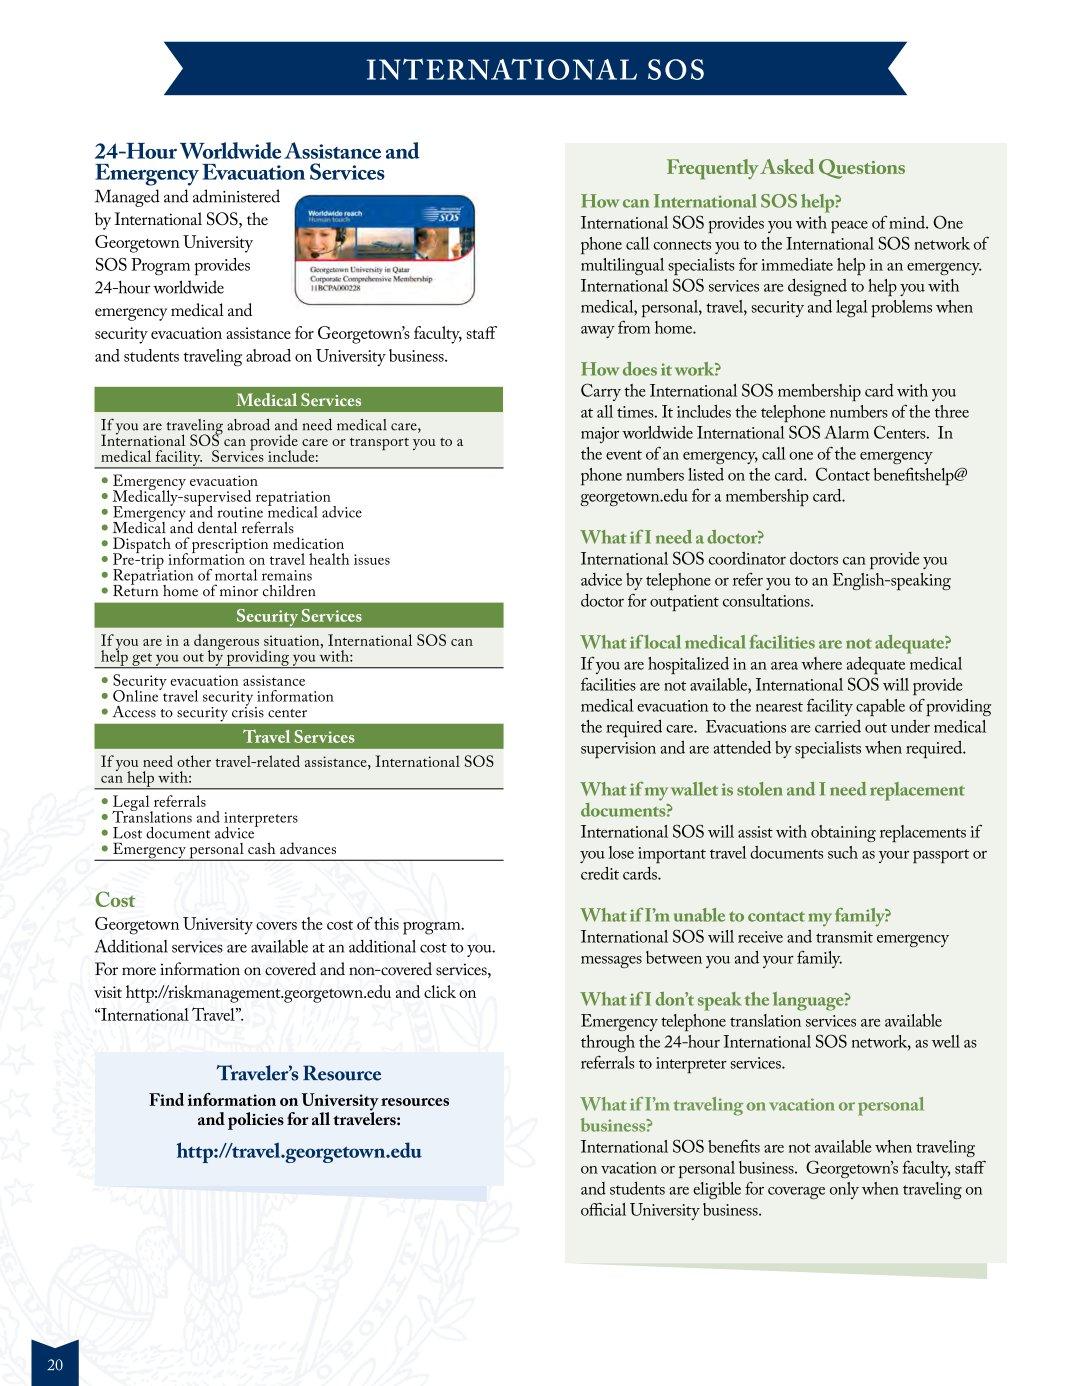 Georgetown 2017 International Benefits Guide